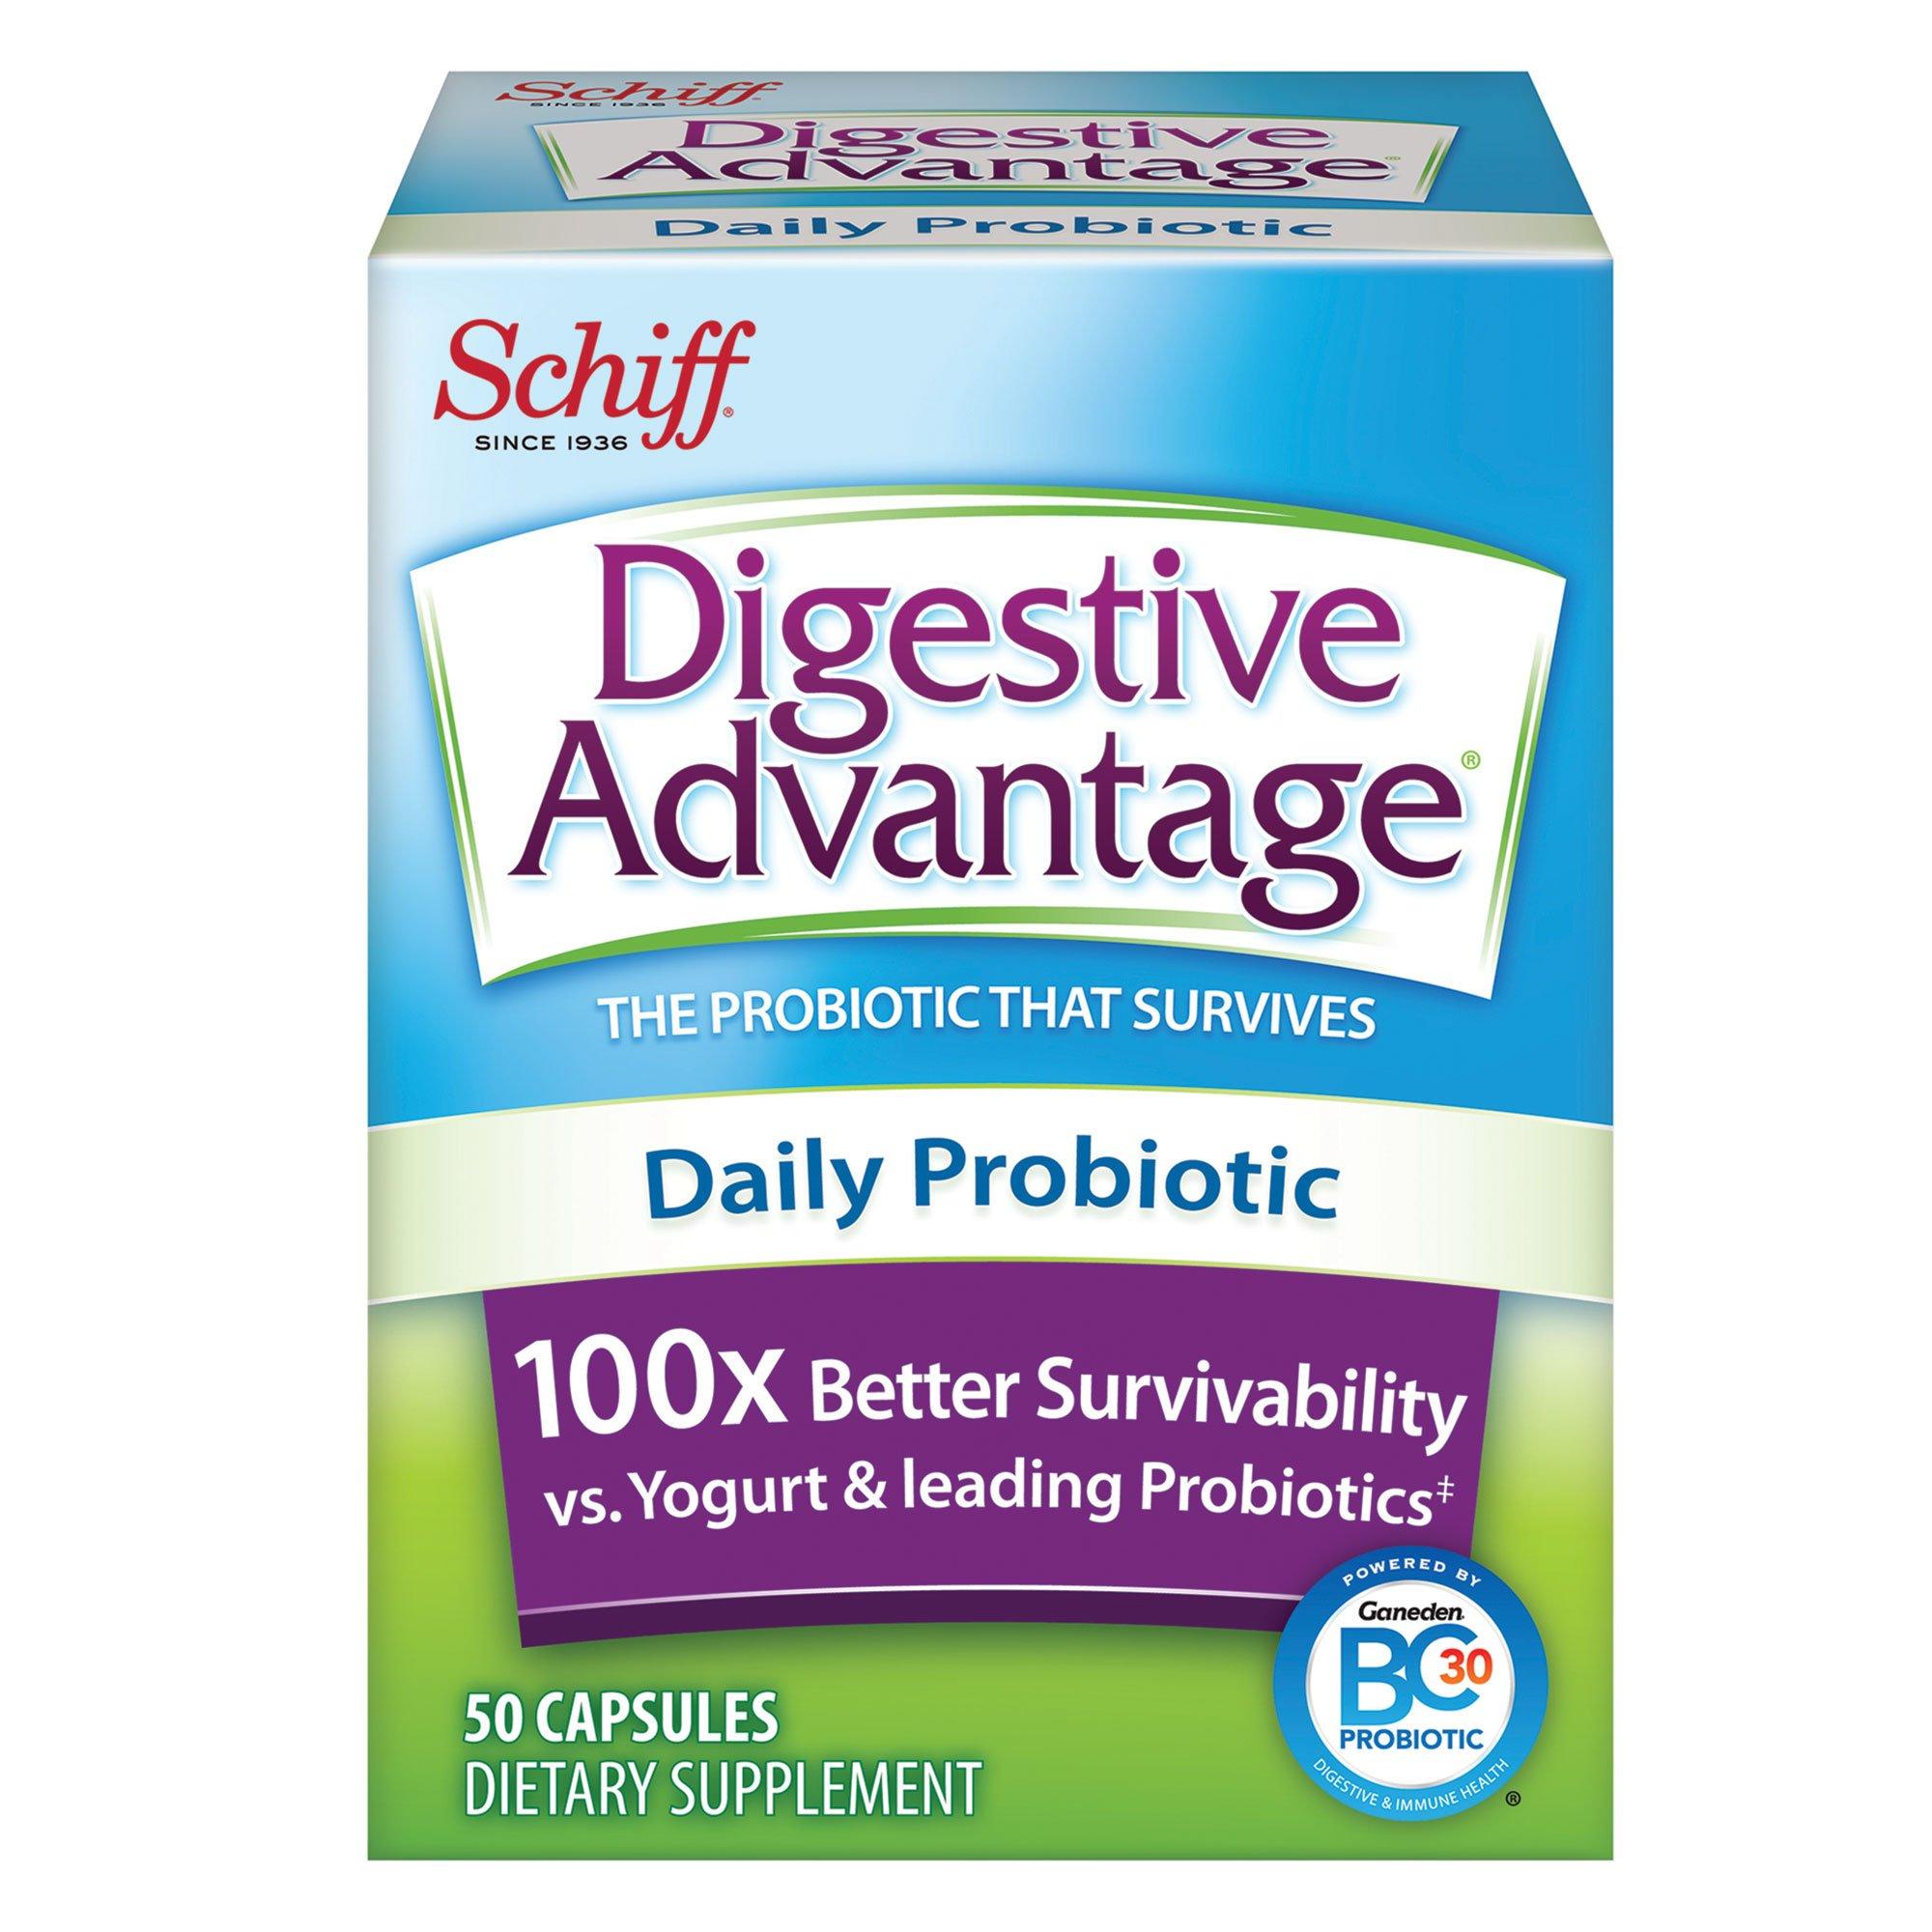 Digestive Advantage Probiotics - Daily Probiotic Capsules, 50 Count